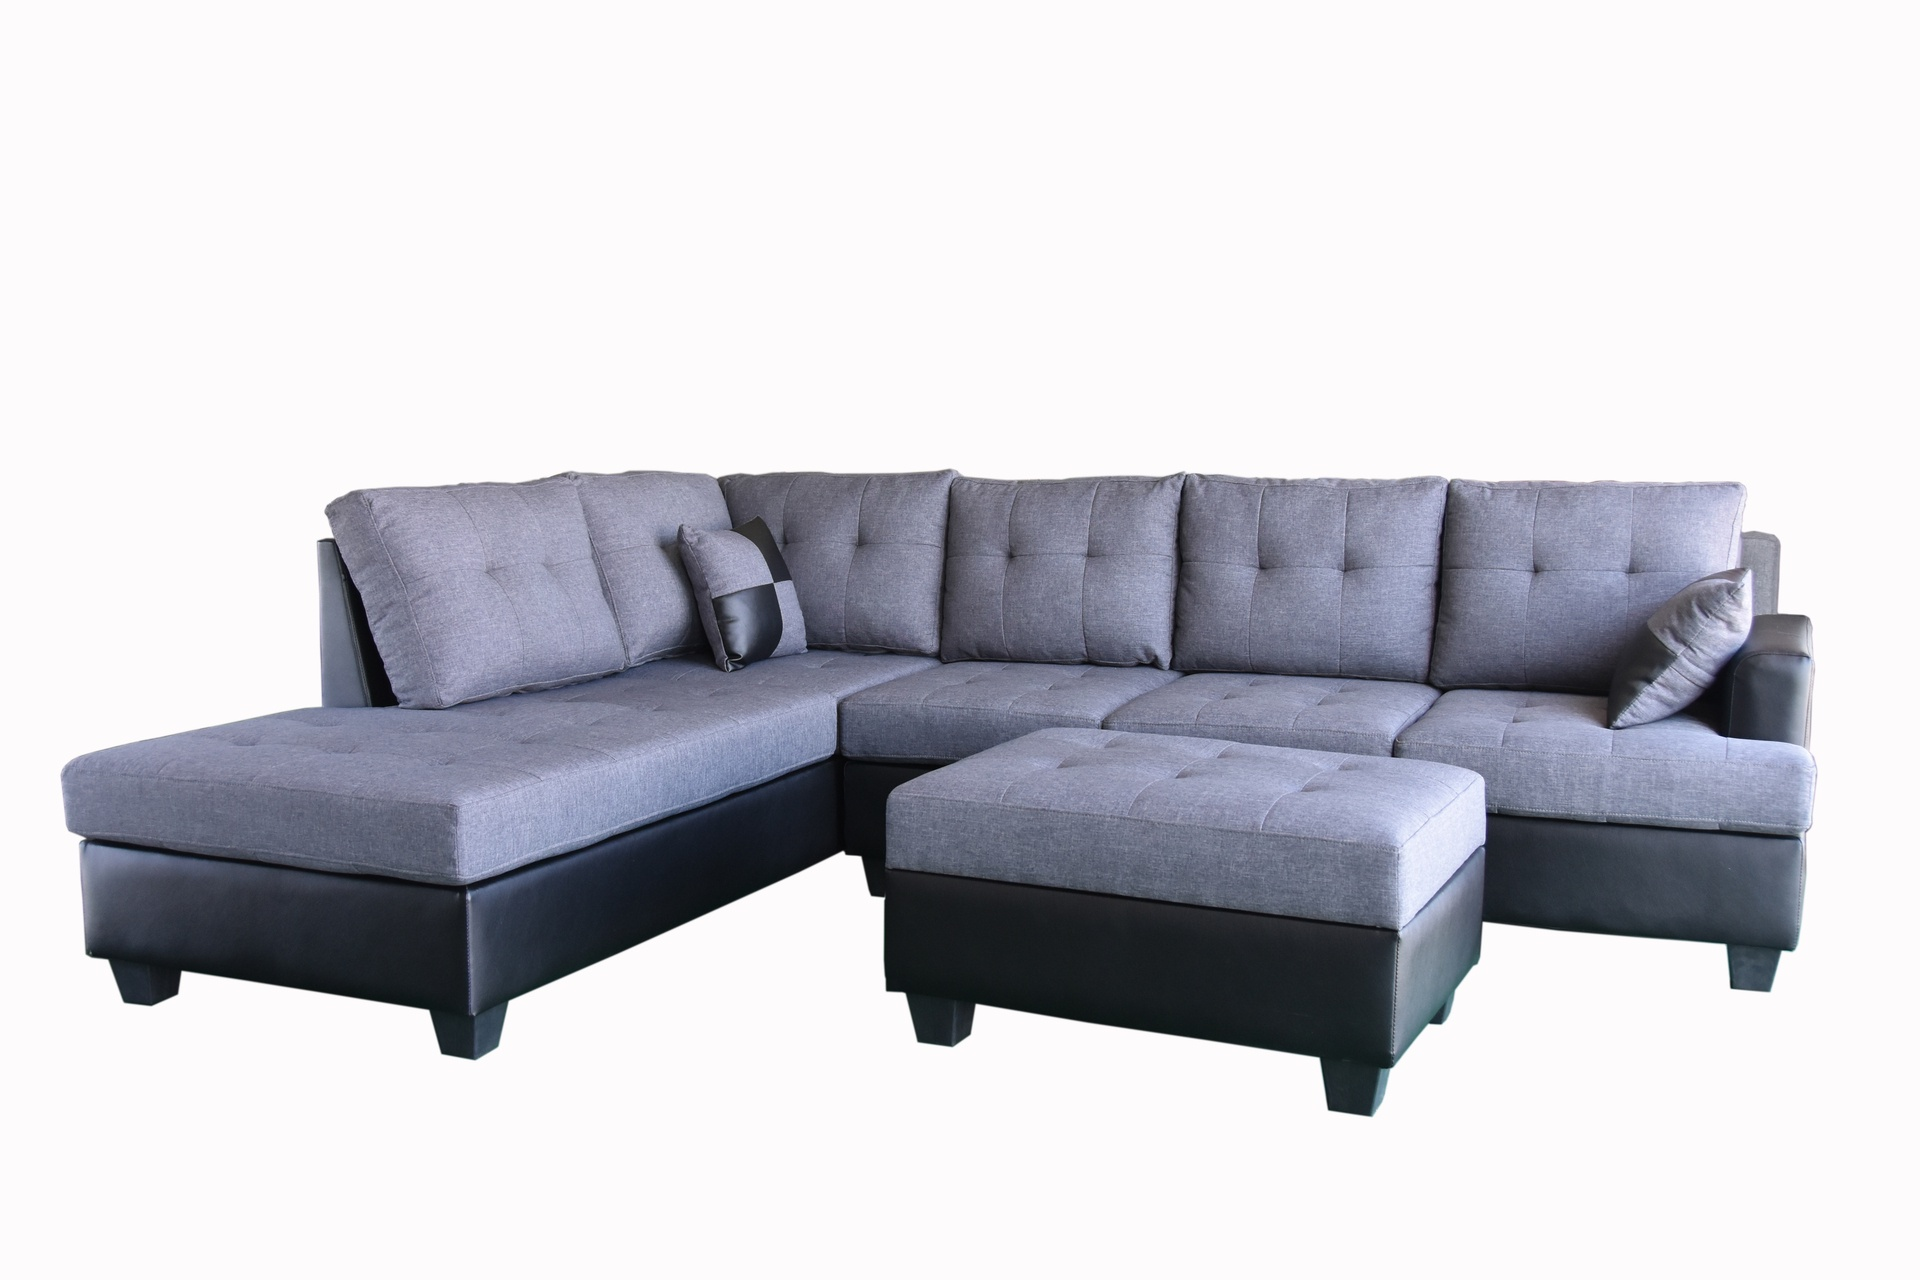 sofa bed nz wellington luxury leather beds ashton 5 seater corner fabric lounge suites